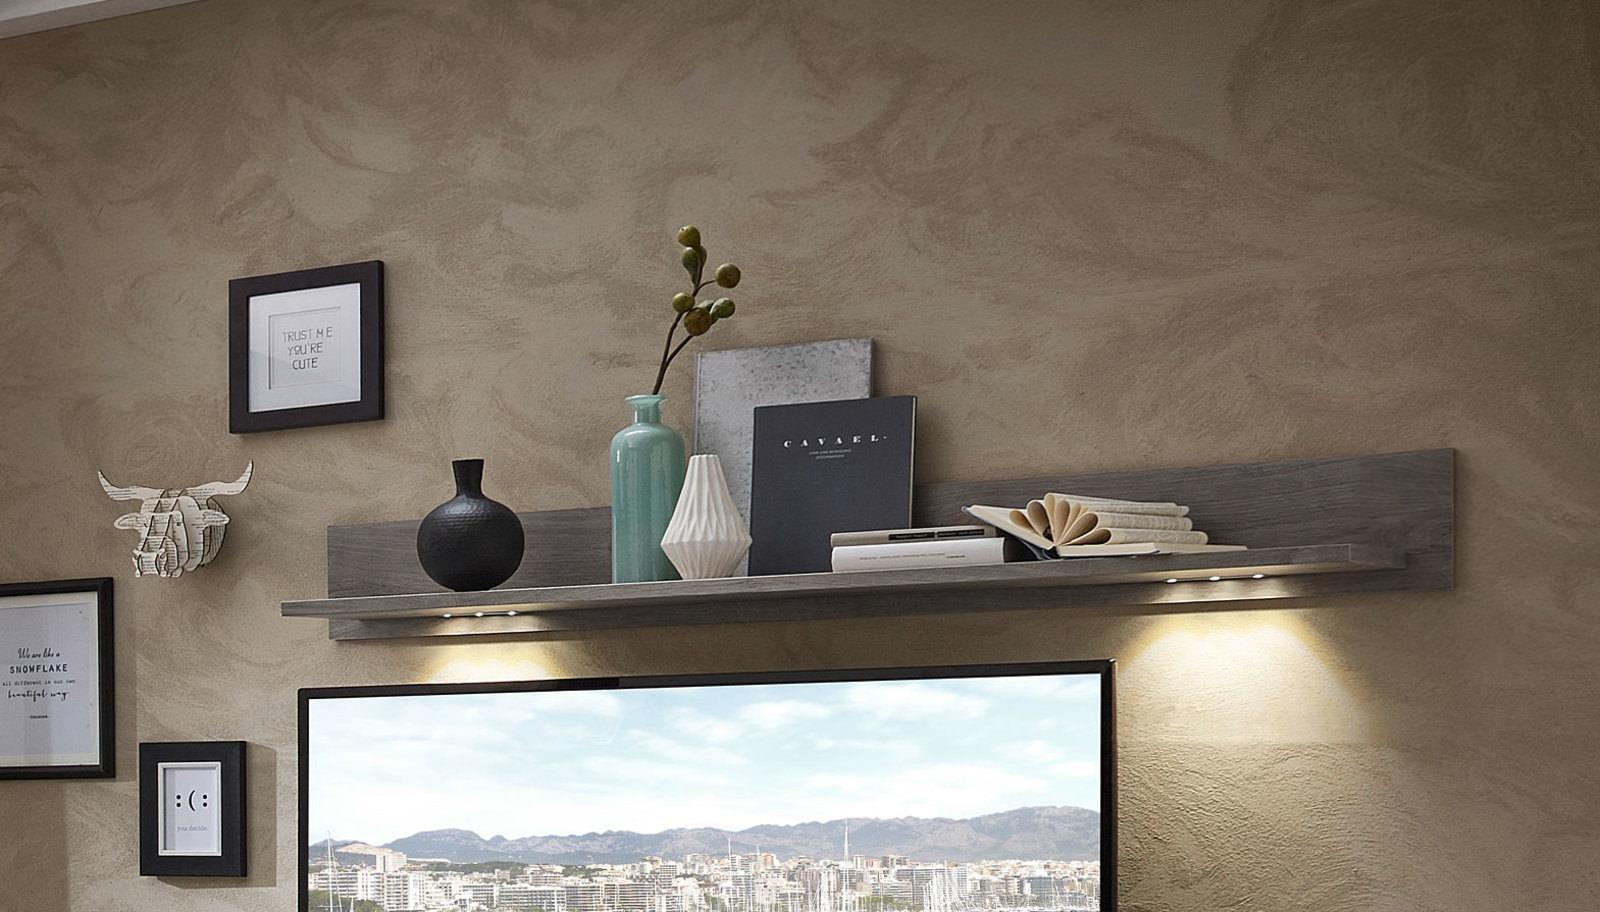 wandboard mit beleuchtung online entdecken knuffmann ihr m belhaus. Black Bedroom Furniture Sets. Home Design Ideas